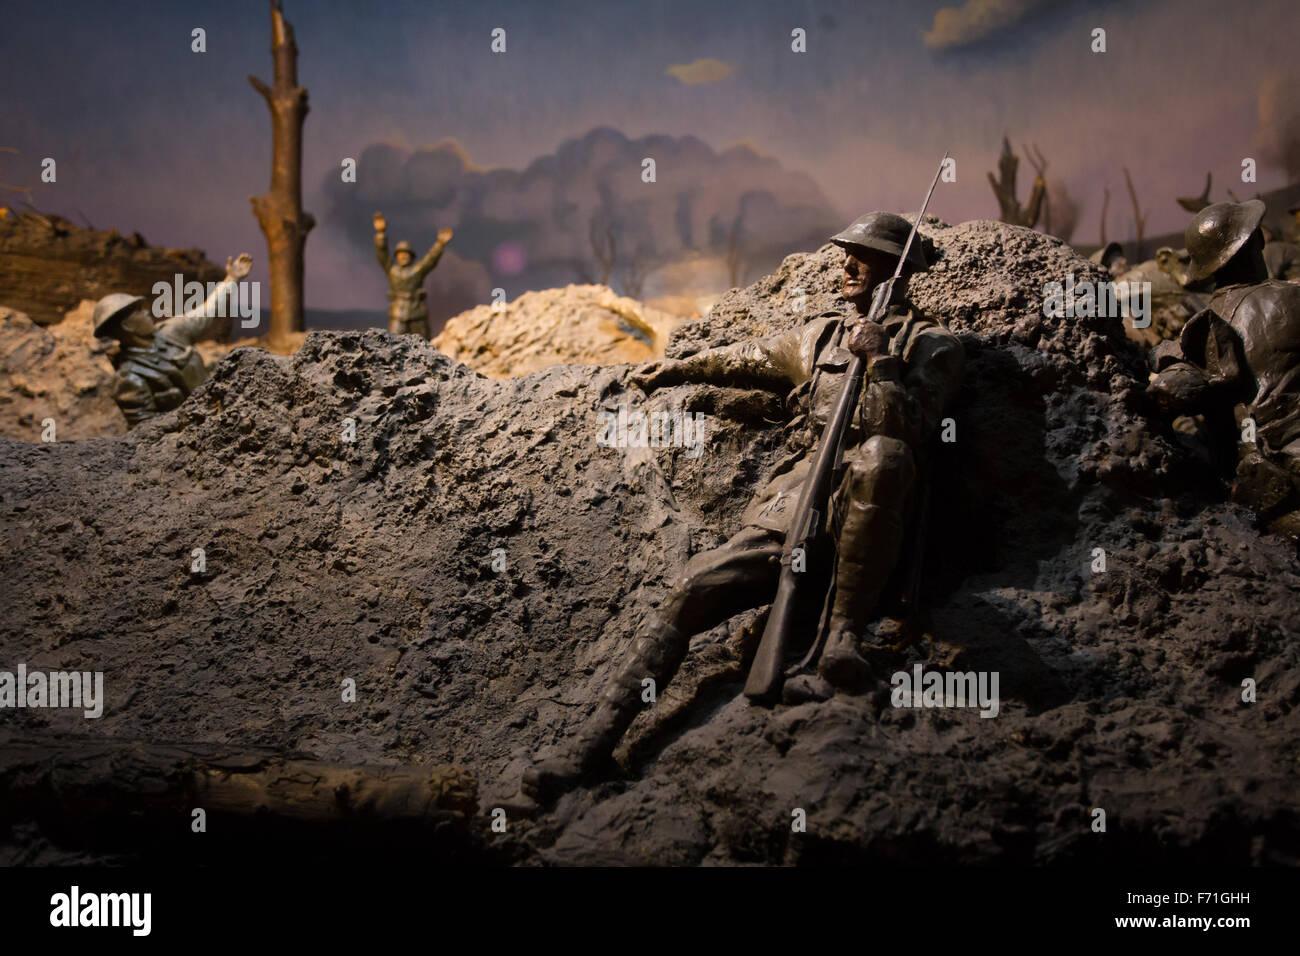 world war 2 battle scene - Stock Image